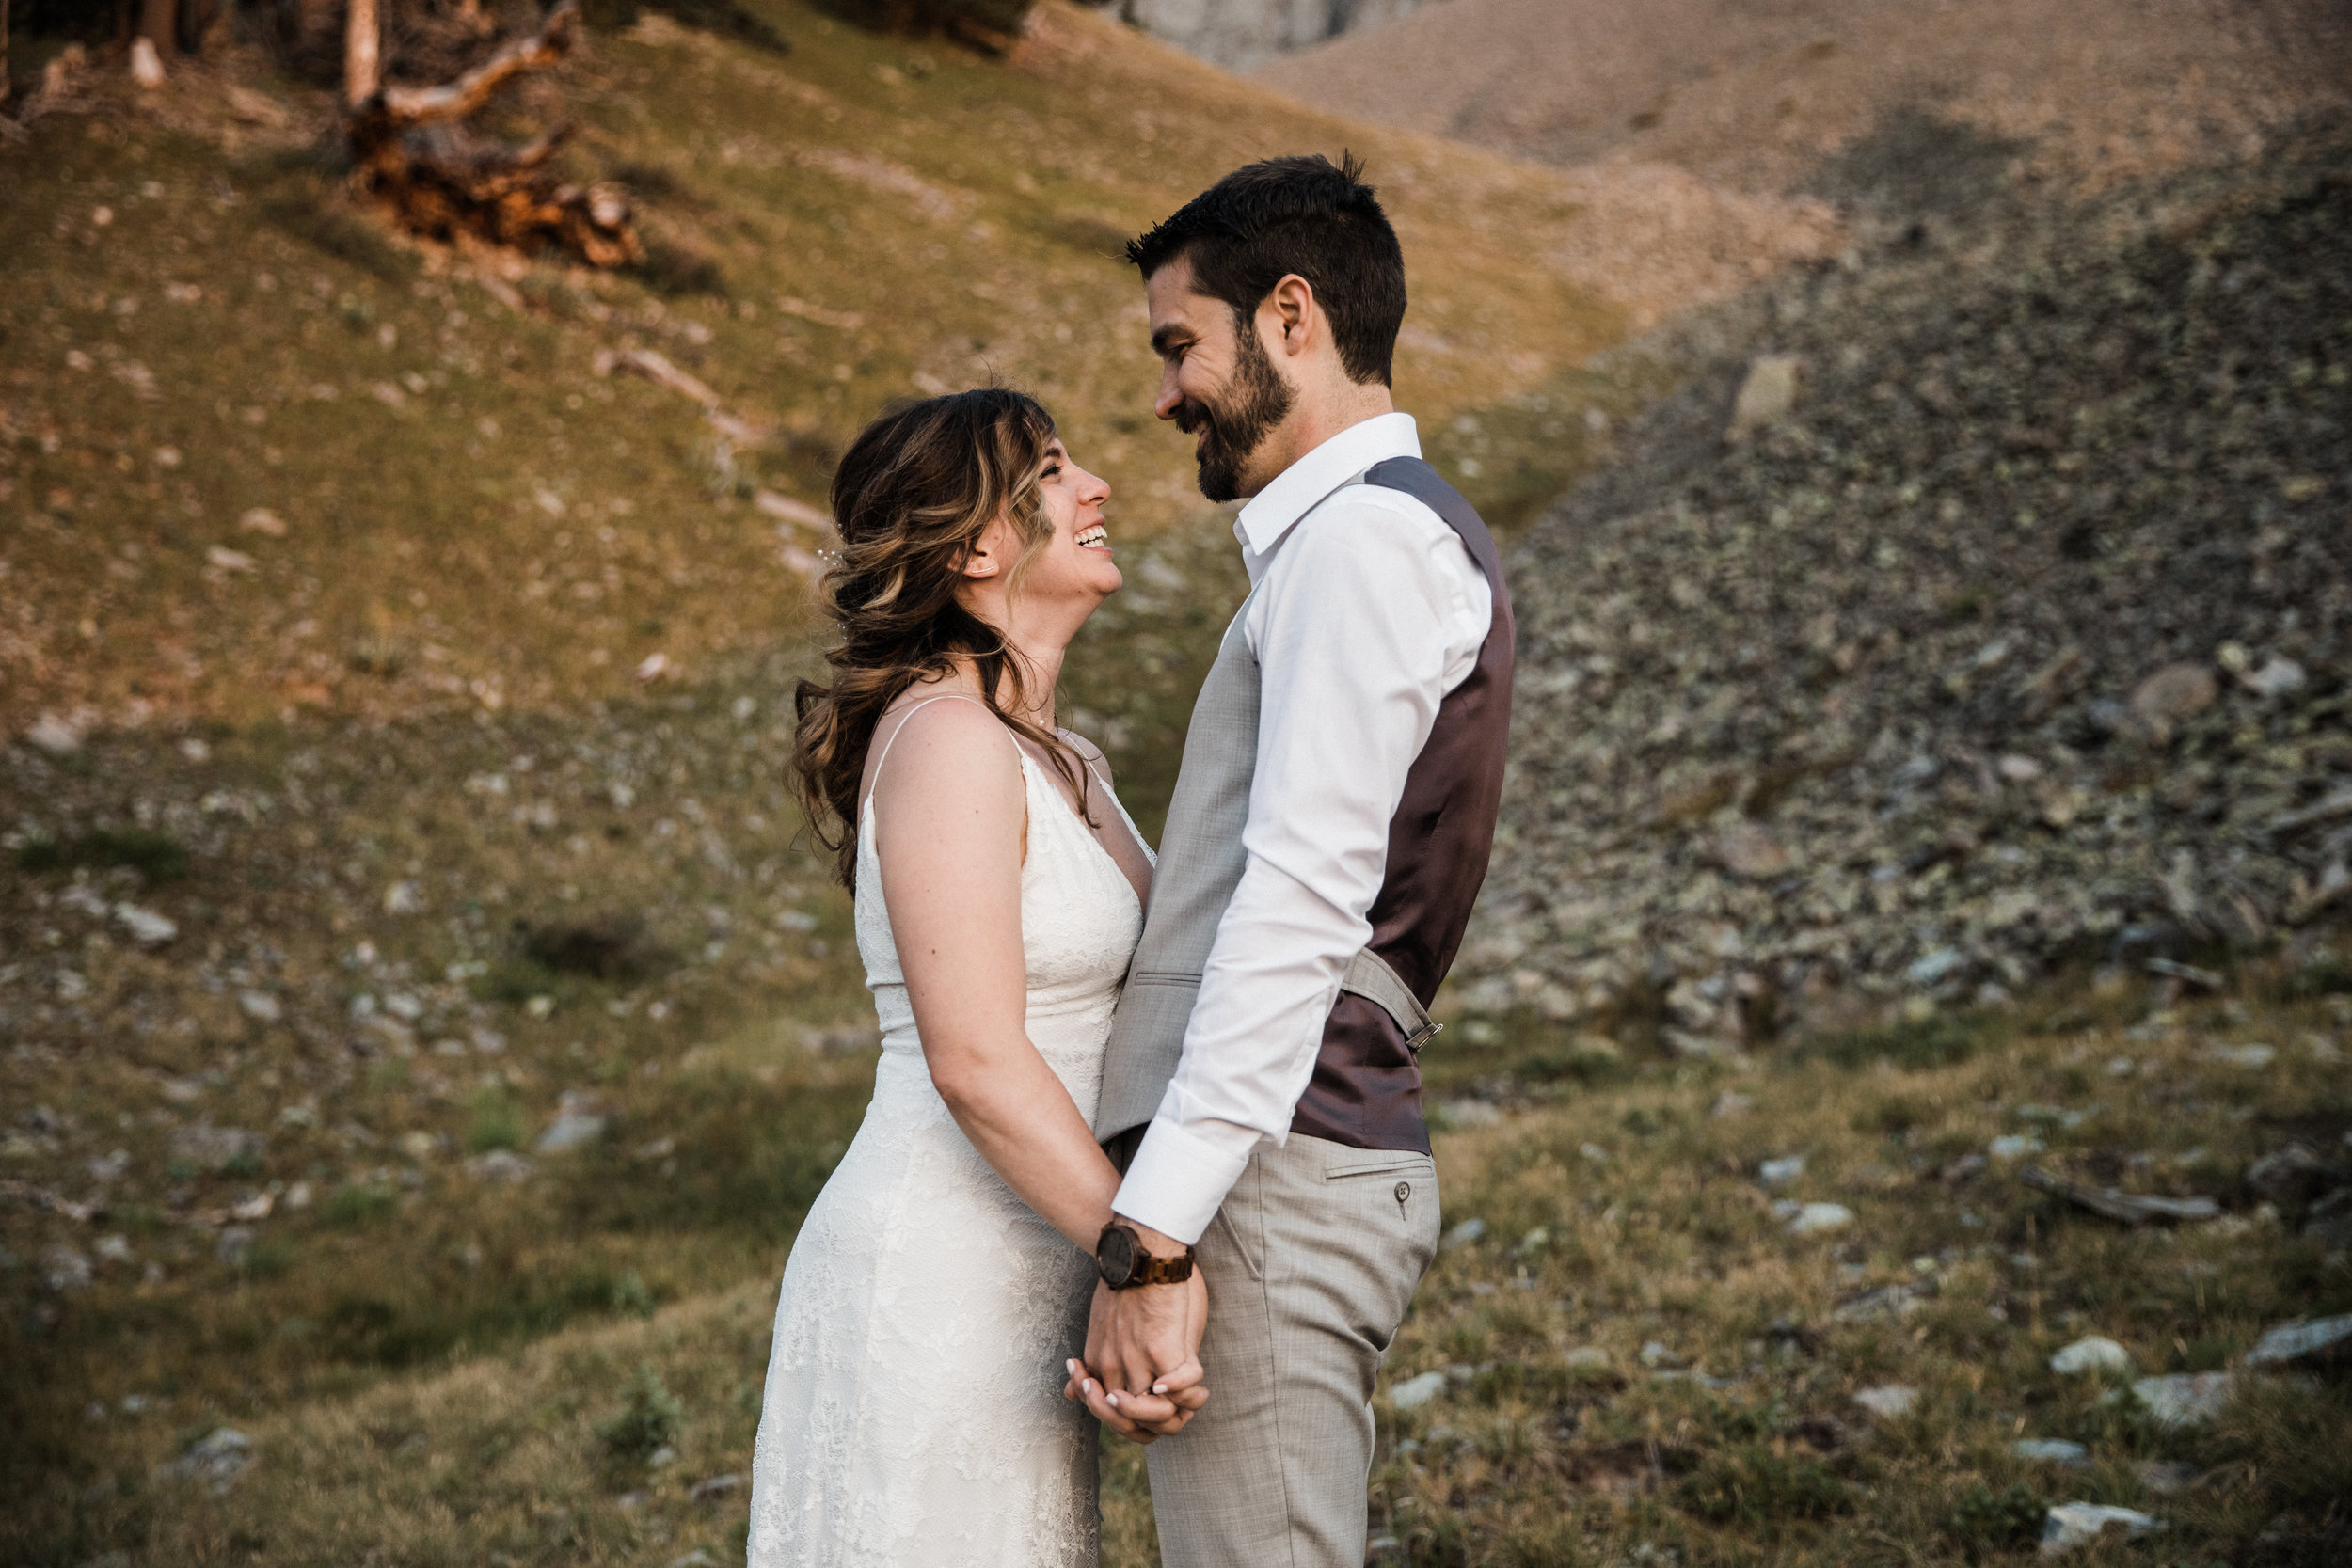 SB-leahandashton-telluride-wedding-photography-0044.jpg